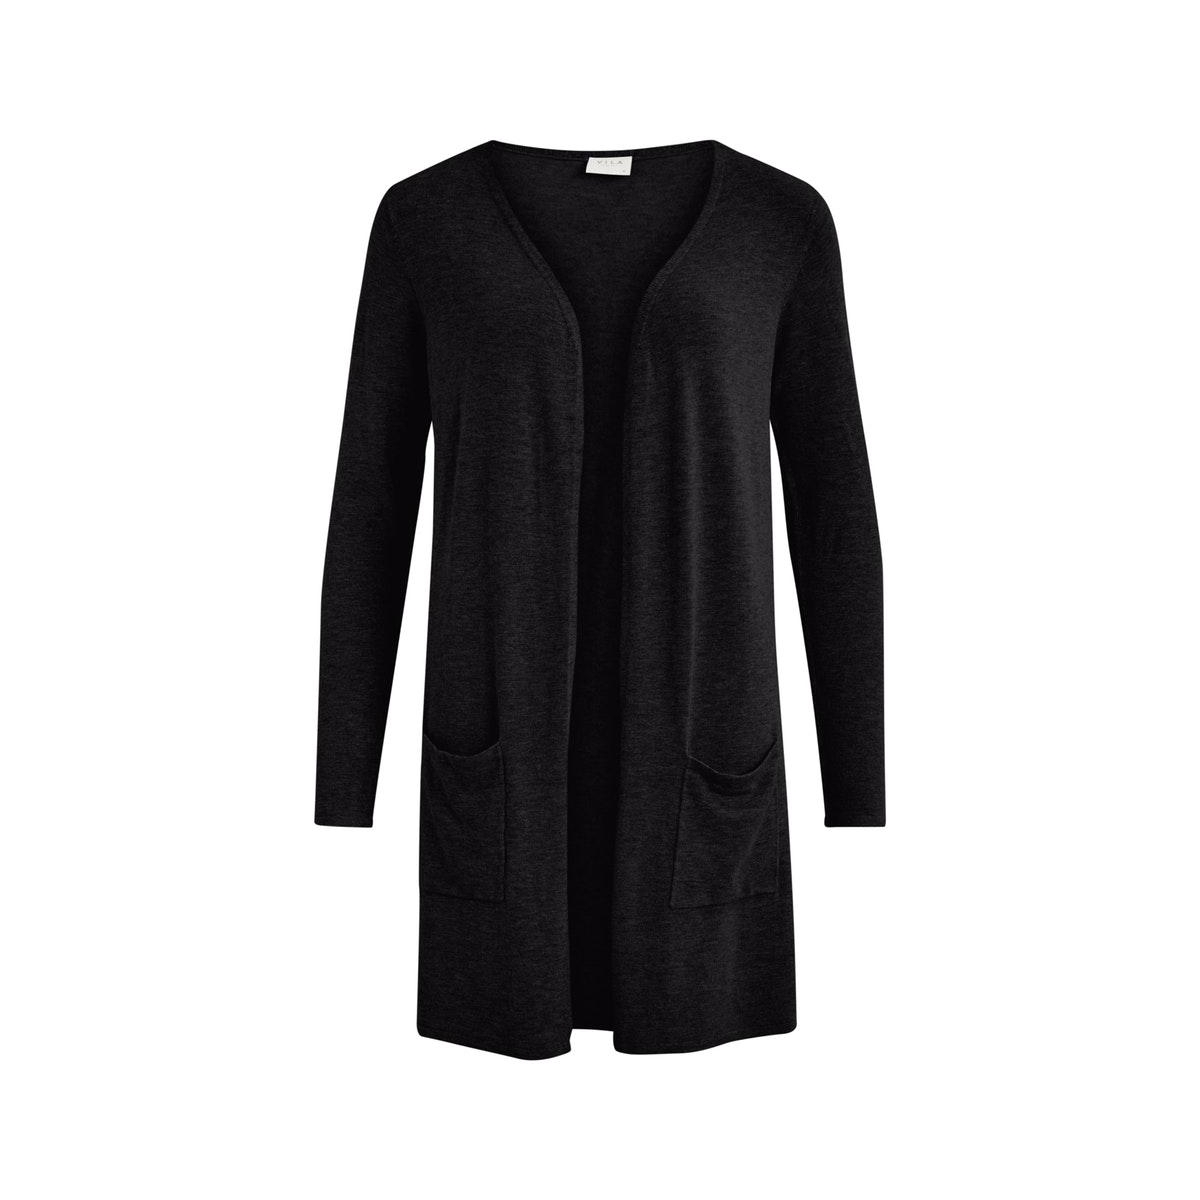 vibolonsia knit pocket l/s cardigan 14058240 vila vest black